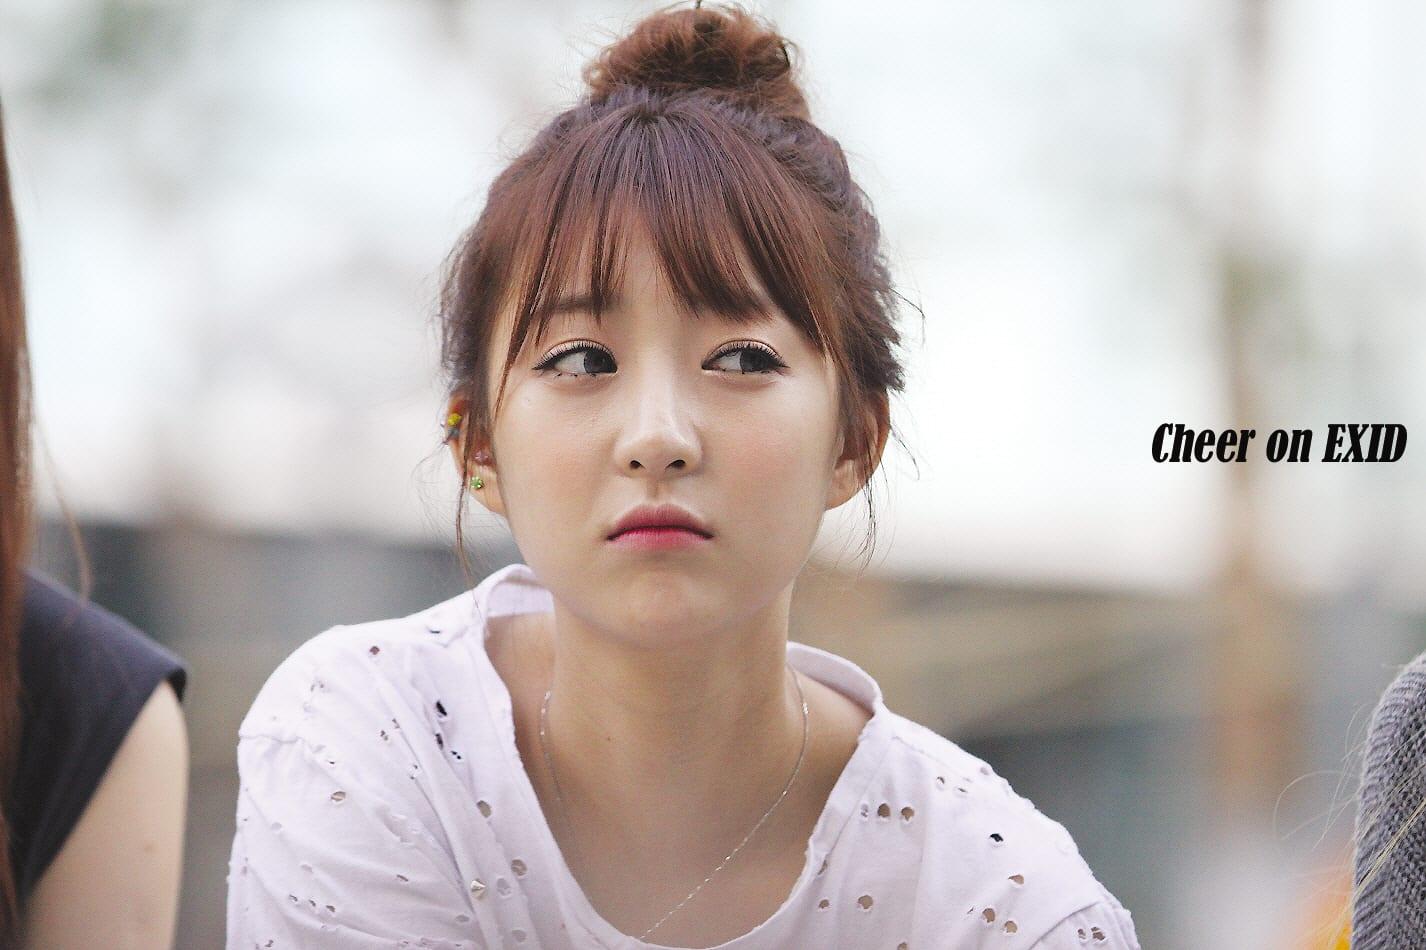 seo Hye lin updates on upcoming album